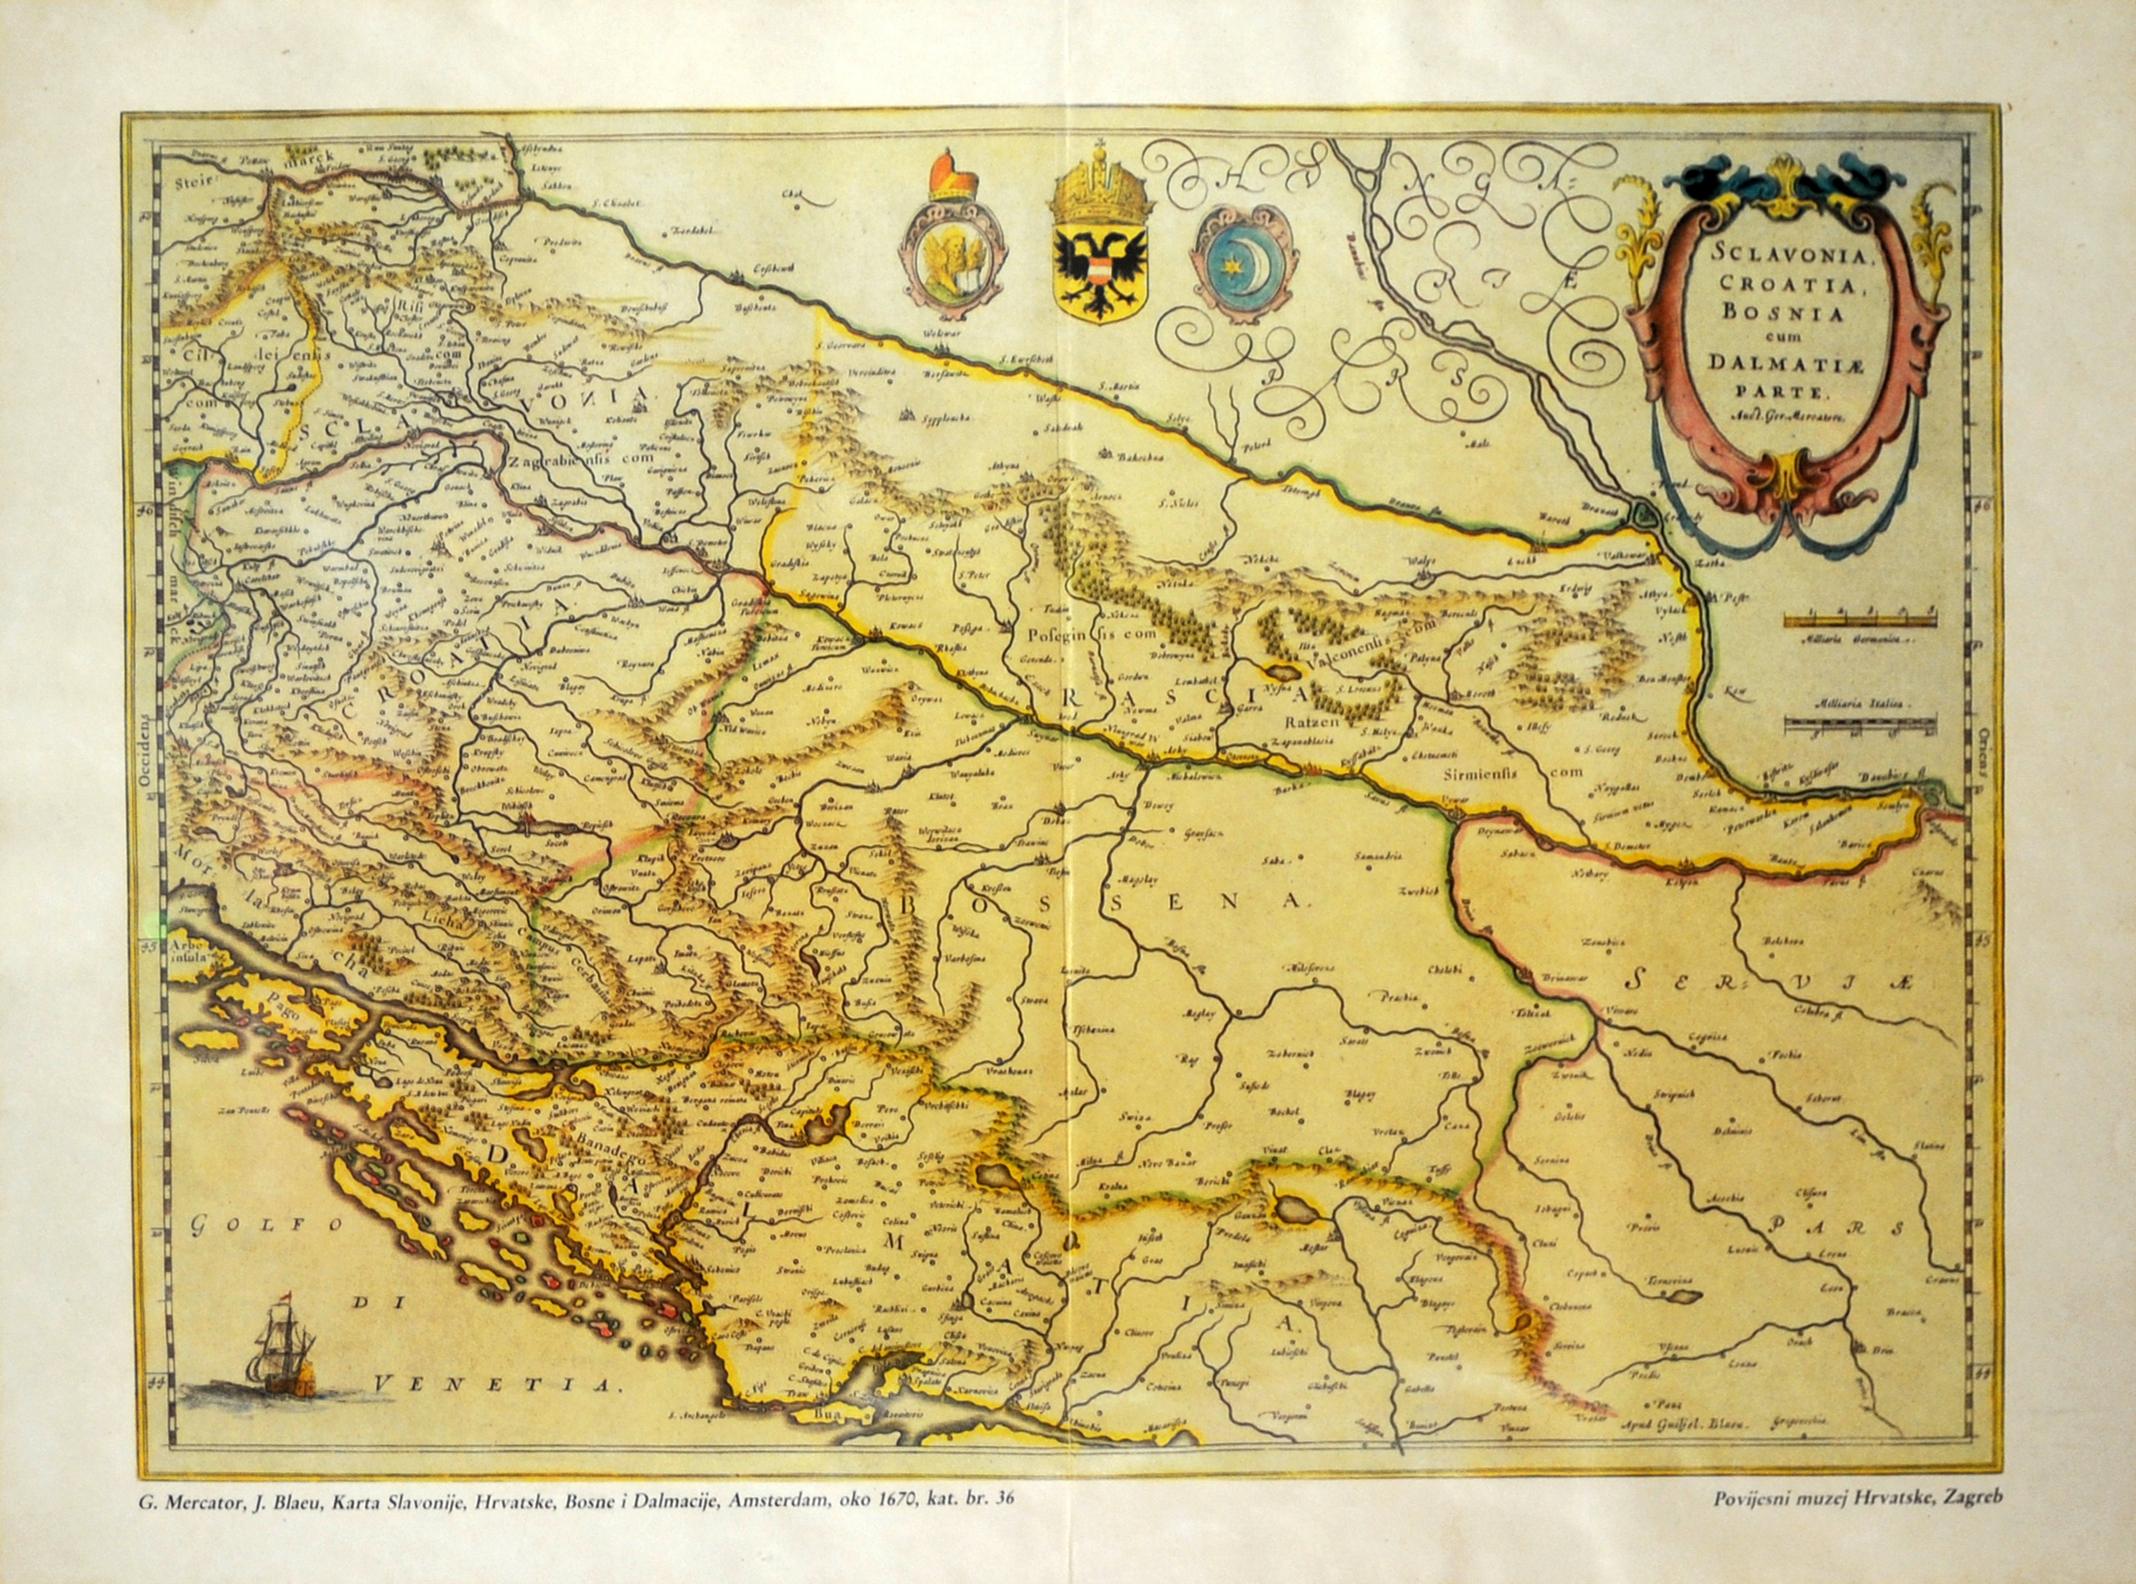 Carte Ancienne Croatie.Le Musee Ethnographique De Split En Croatie